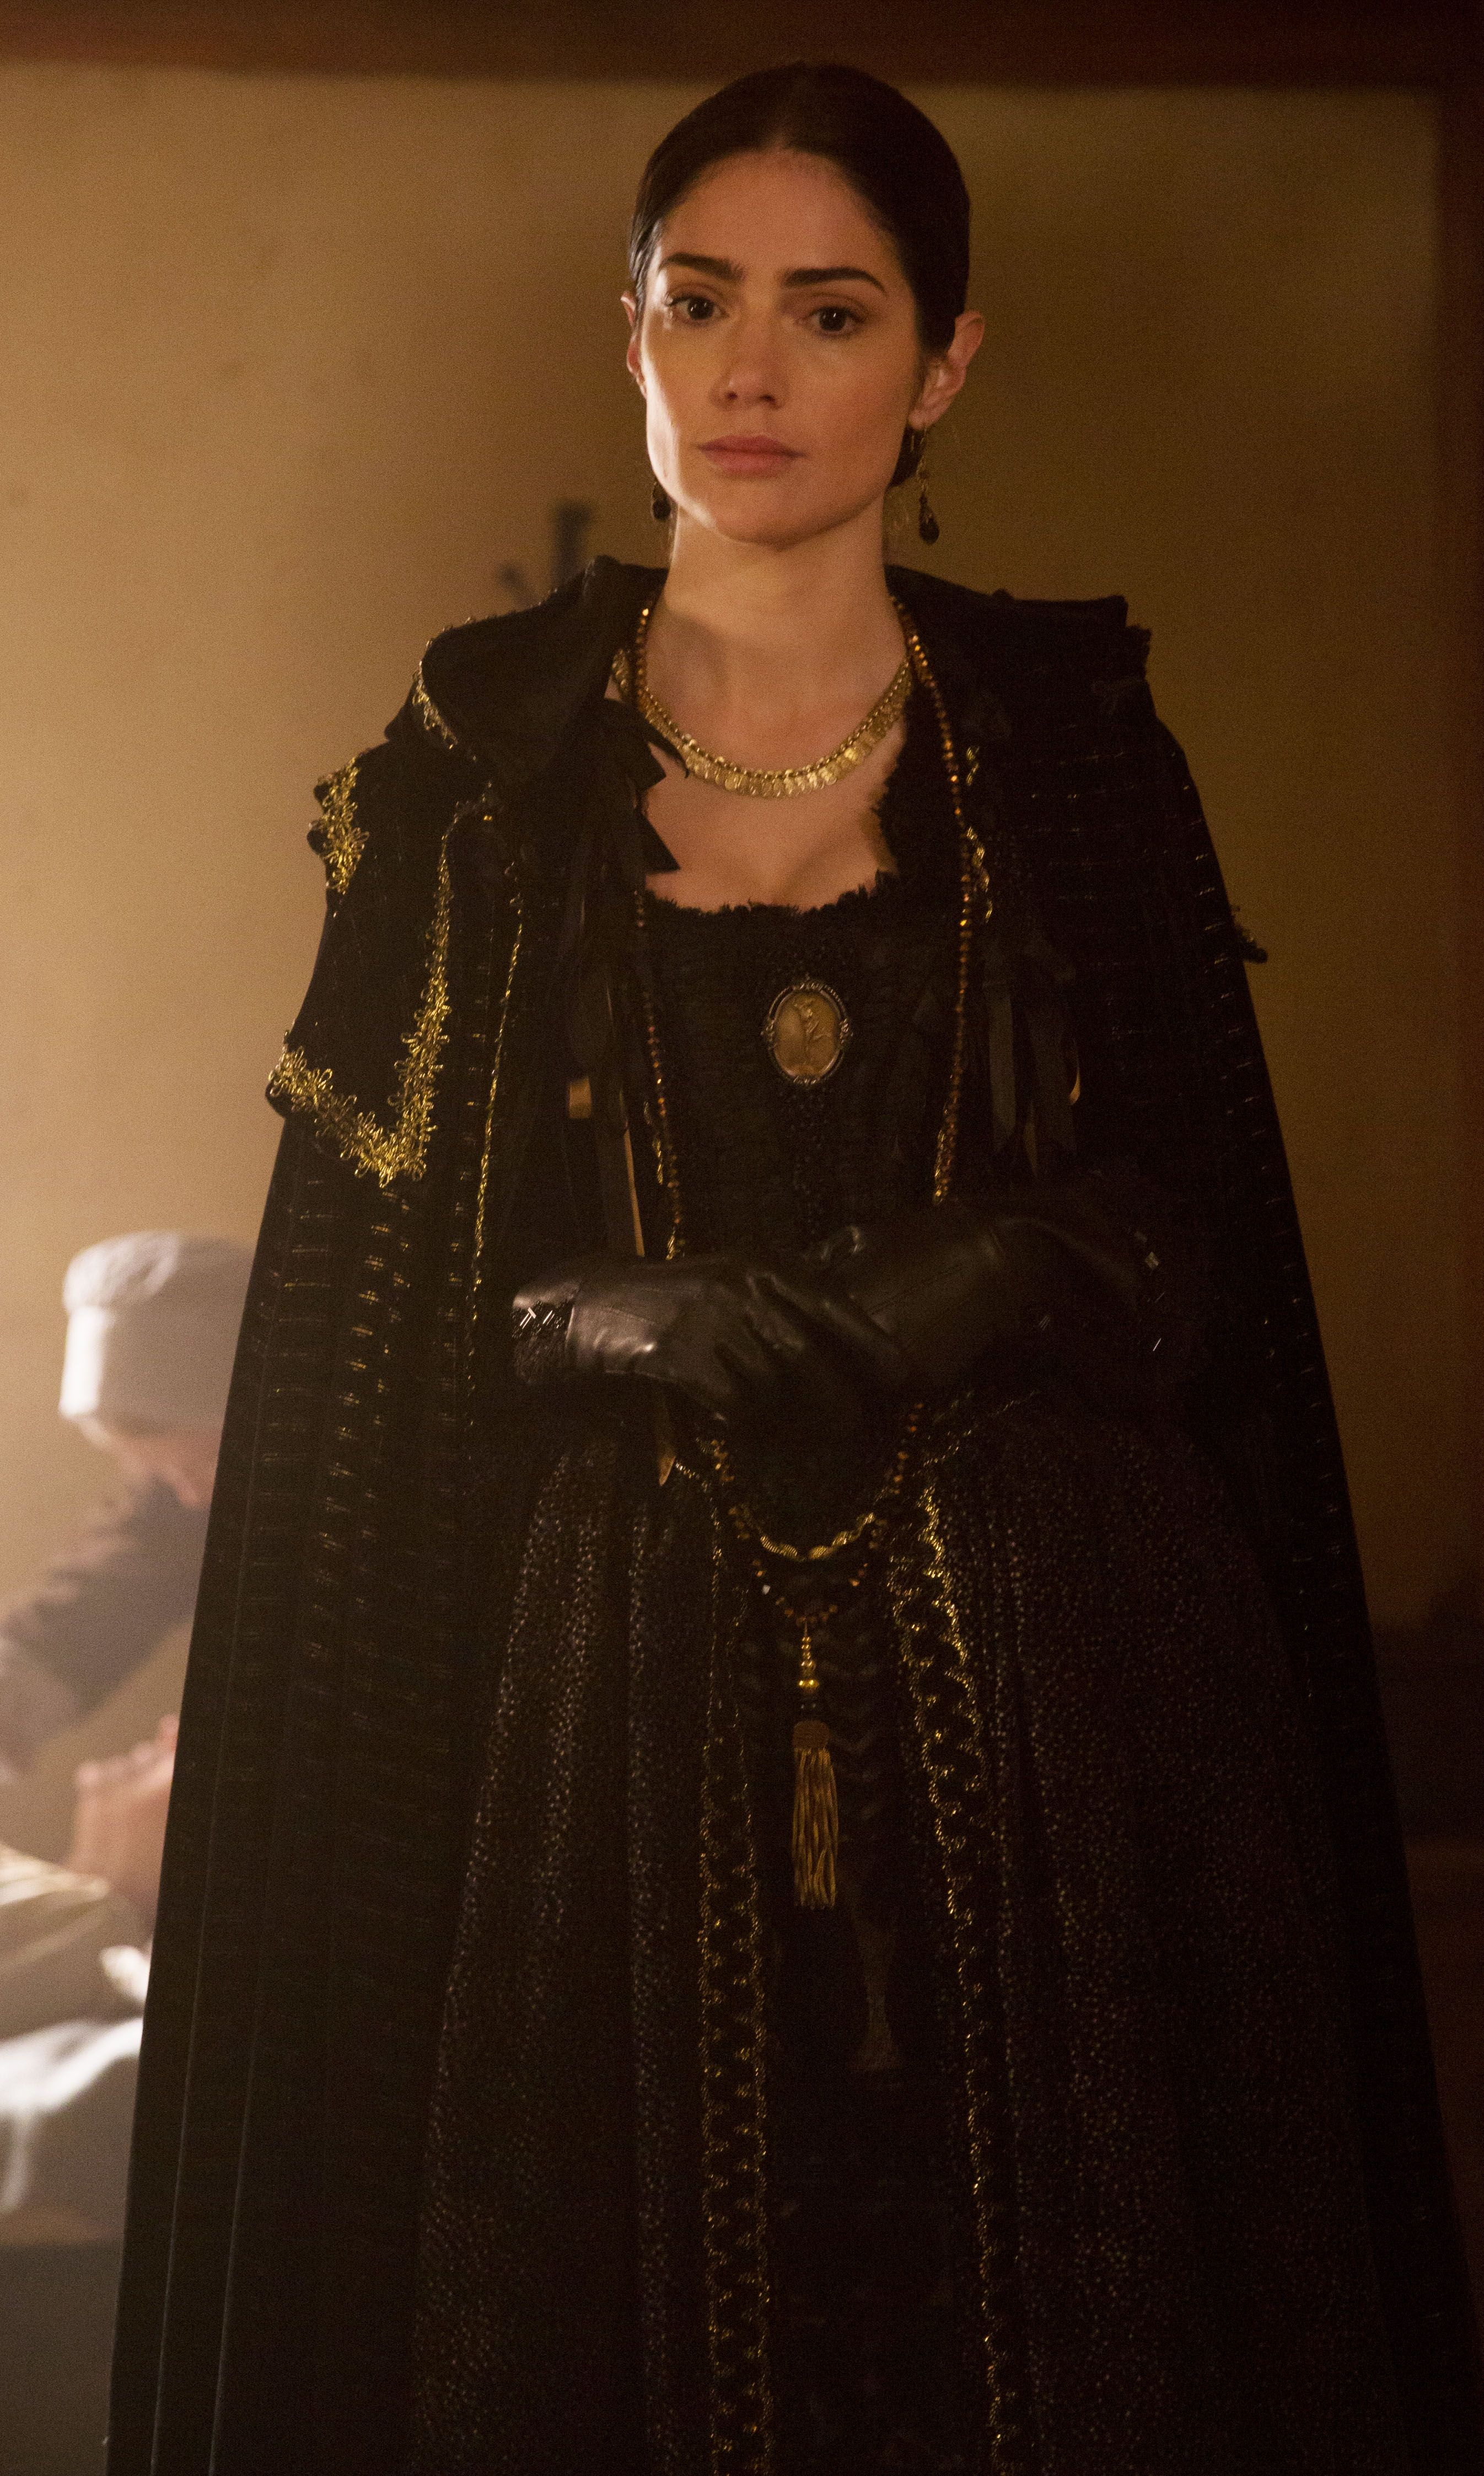 Salem - Season 1 Episode 11 Still | Salem | Pinterest | Costumes ...